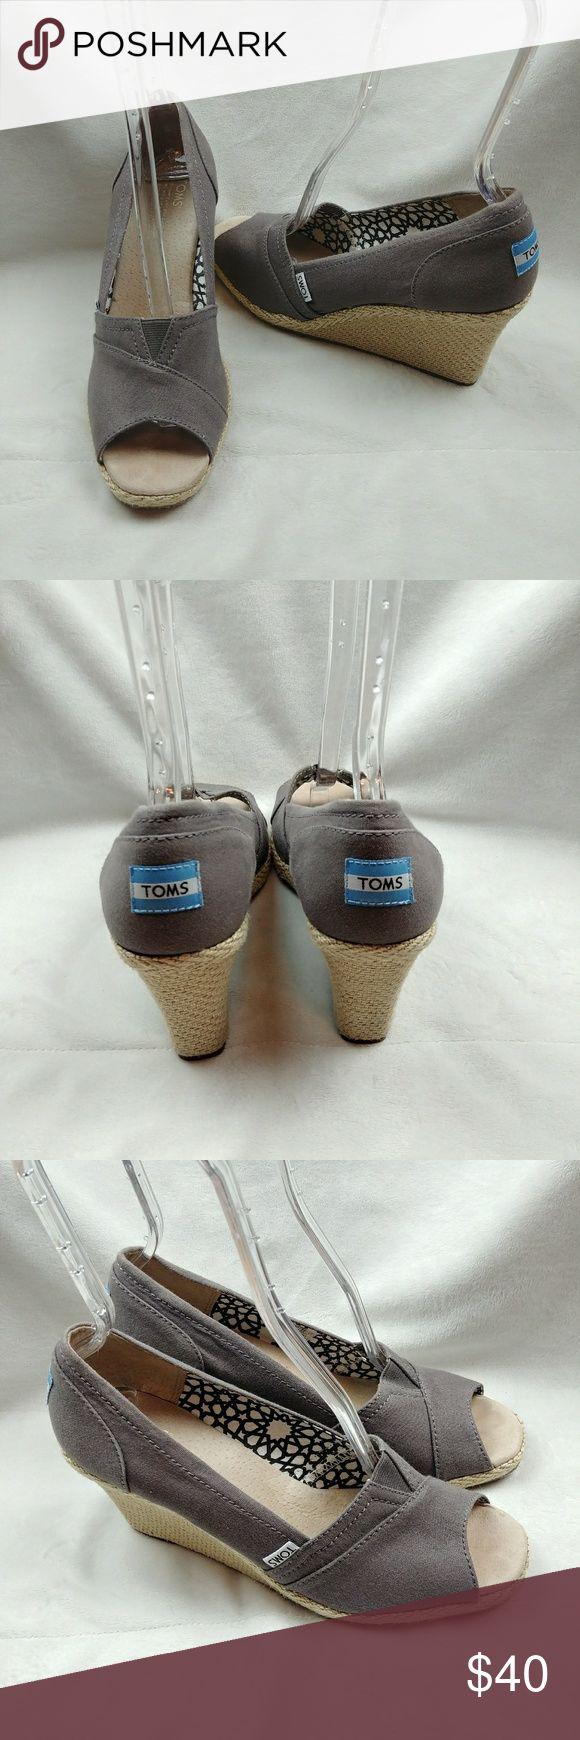 "Toms Espadrille Open Toe Wedges Sandals Gray Women Toms Espadrille Open Toe Wedges Sandals Gray Women Shoes Size 10   Back Platform: 3.5"" inch   Front: 1/2"" inch Toms Shoes Wedges"